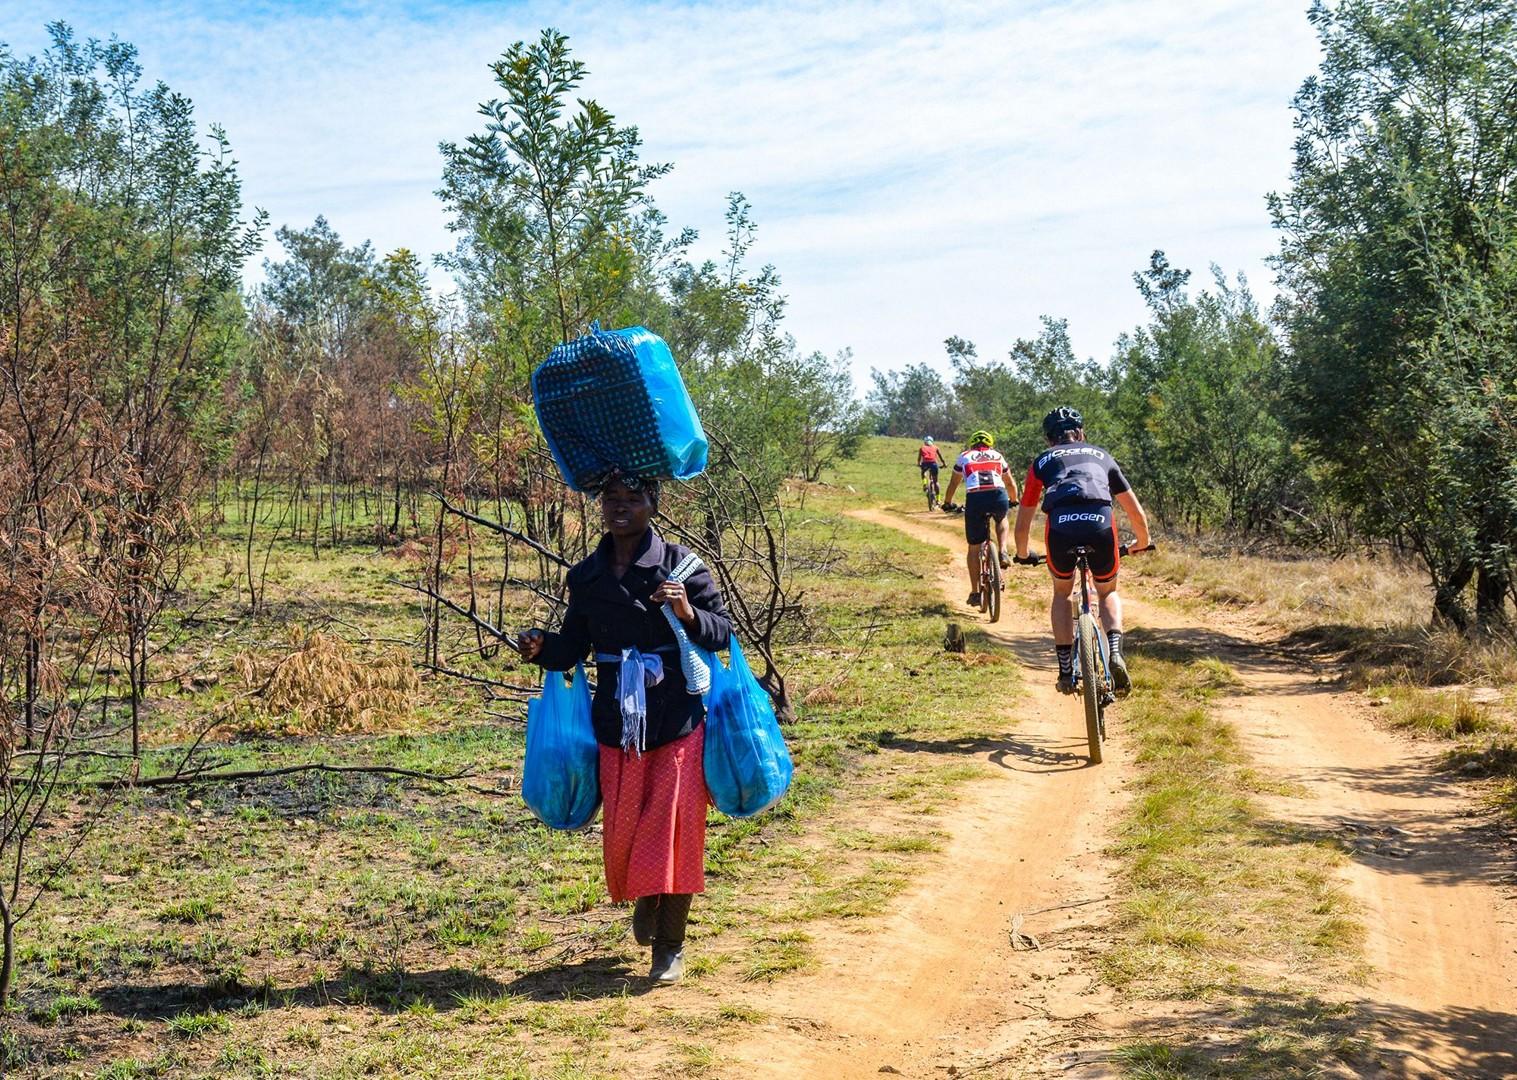 rgfdgfg10.jpg - Eswatini (Swaziland) - Cycling Safari - Cycling Adventures